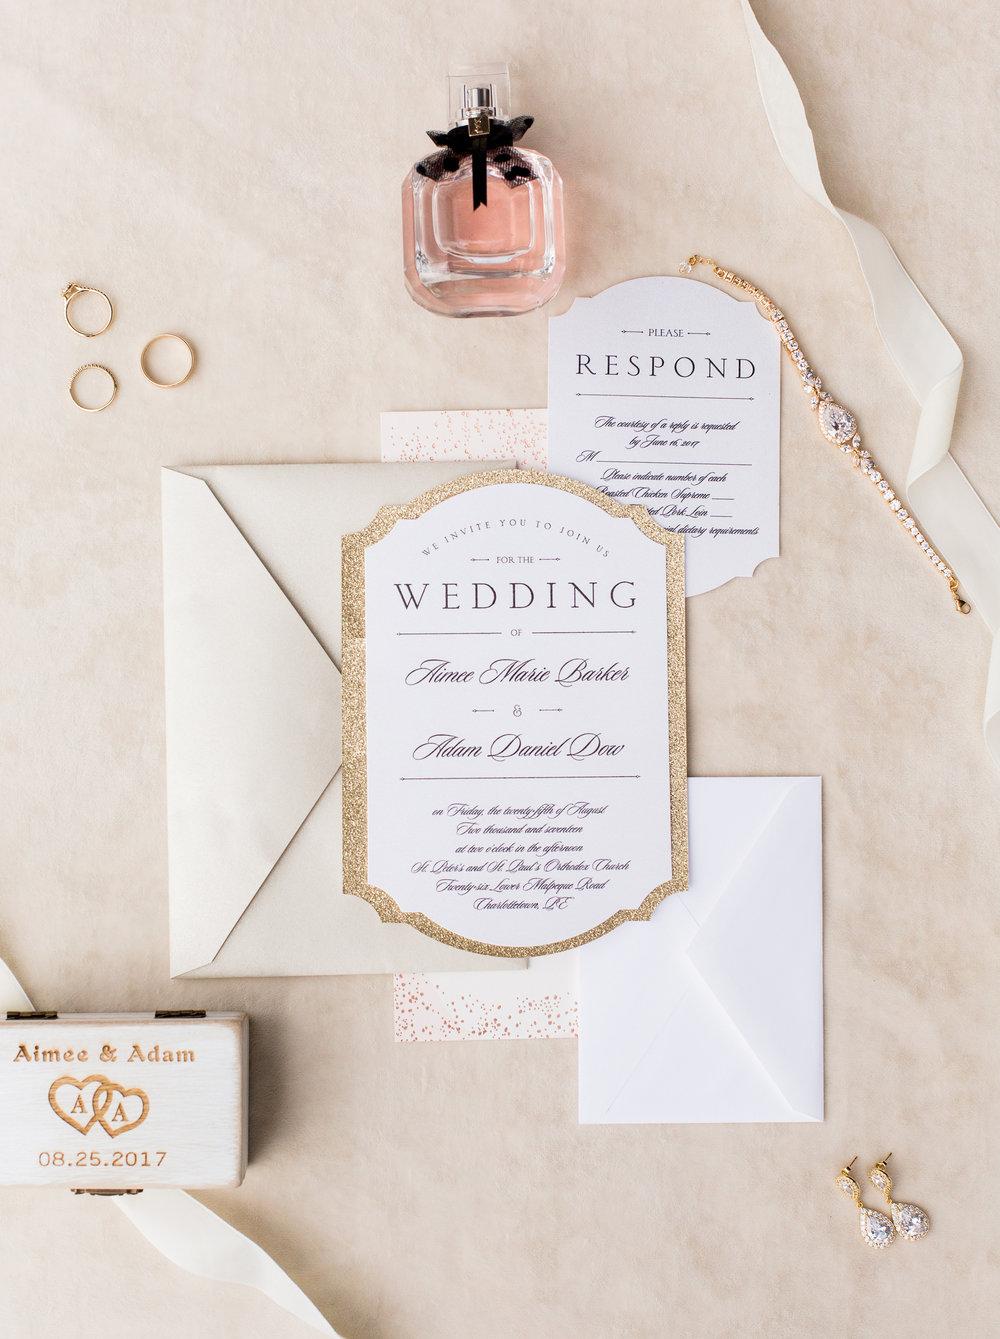 006-pei-wedding-photographers--.jpg